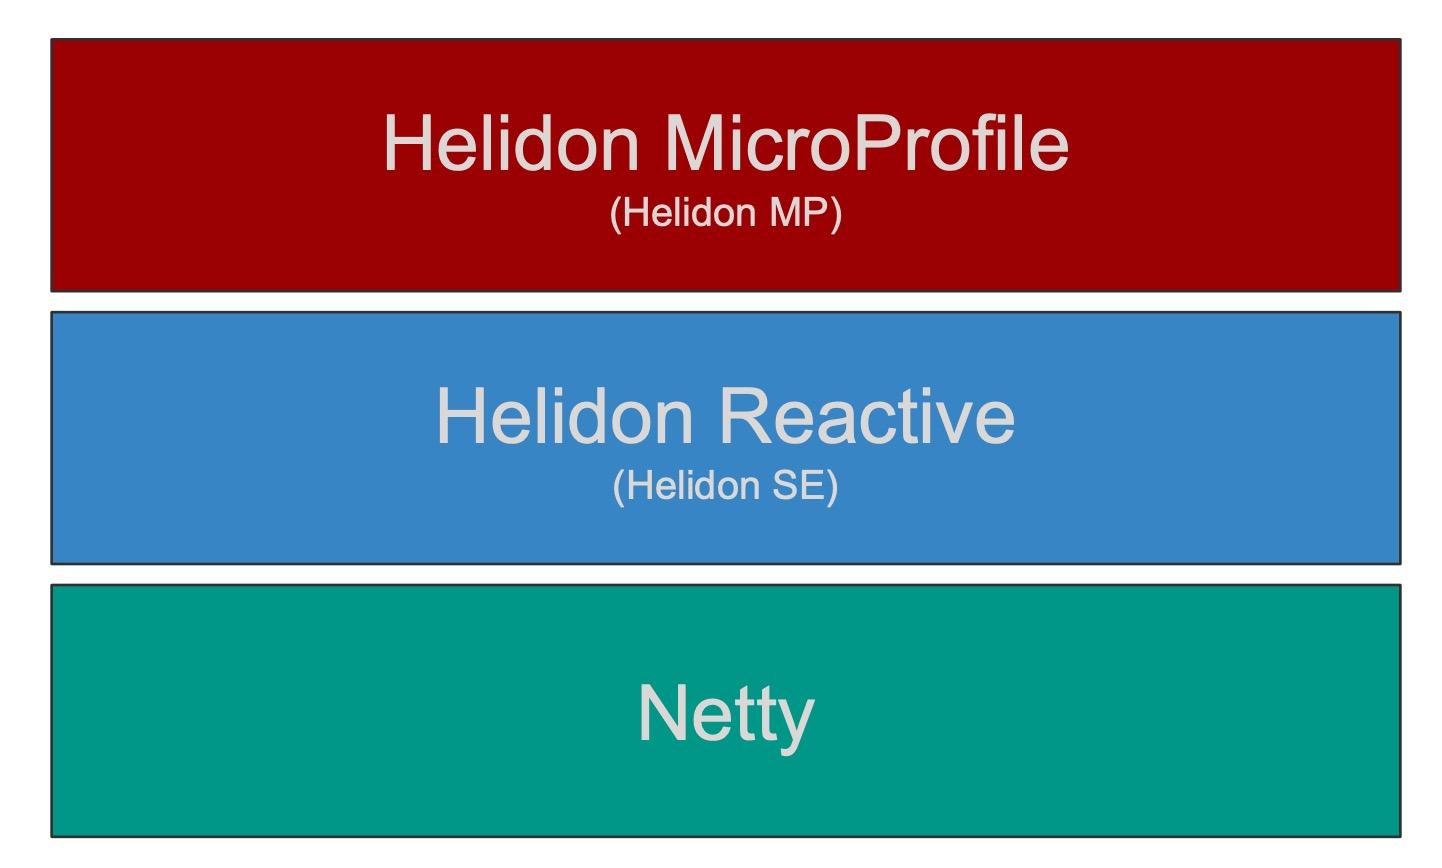 Архитектура Helidon